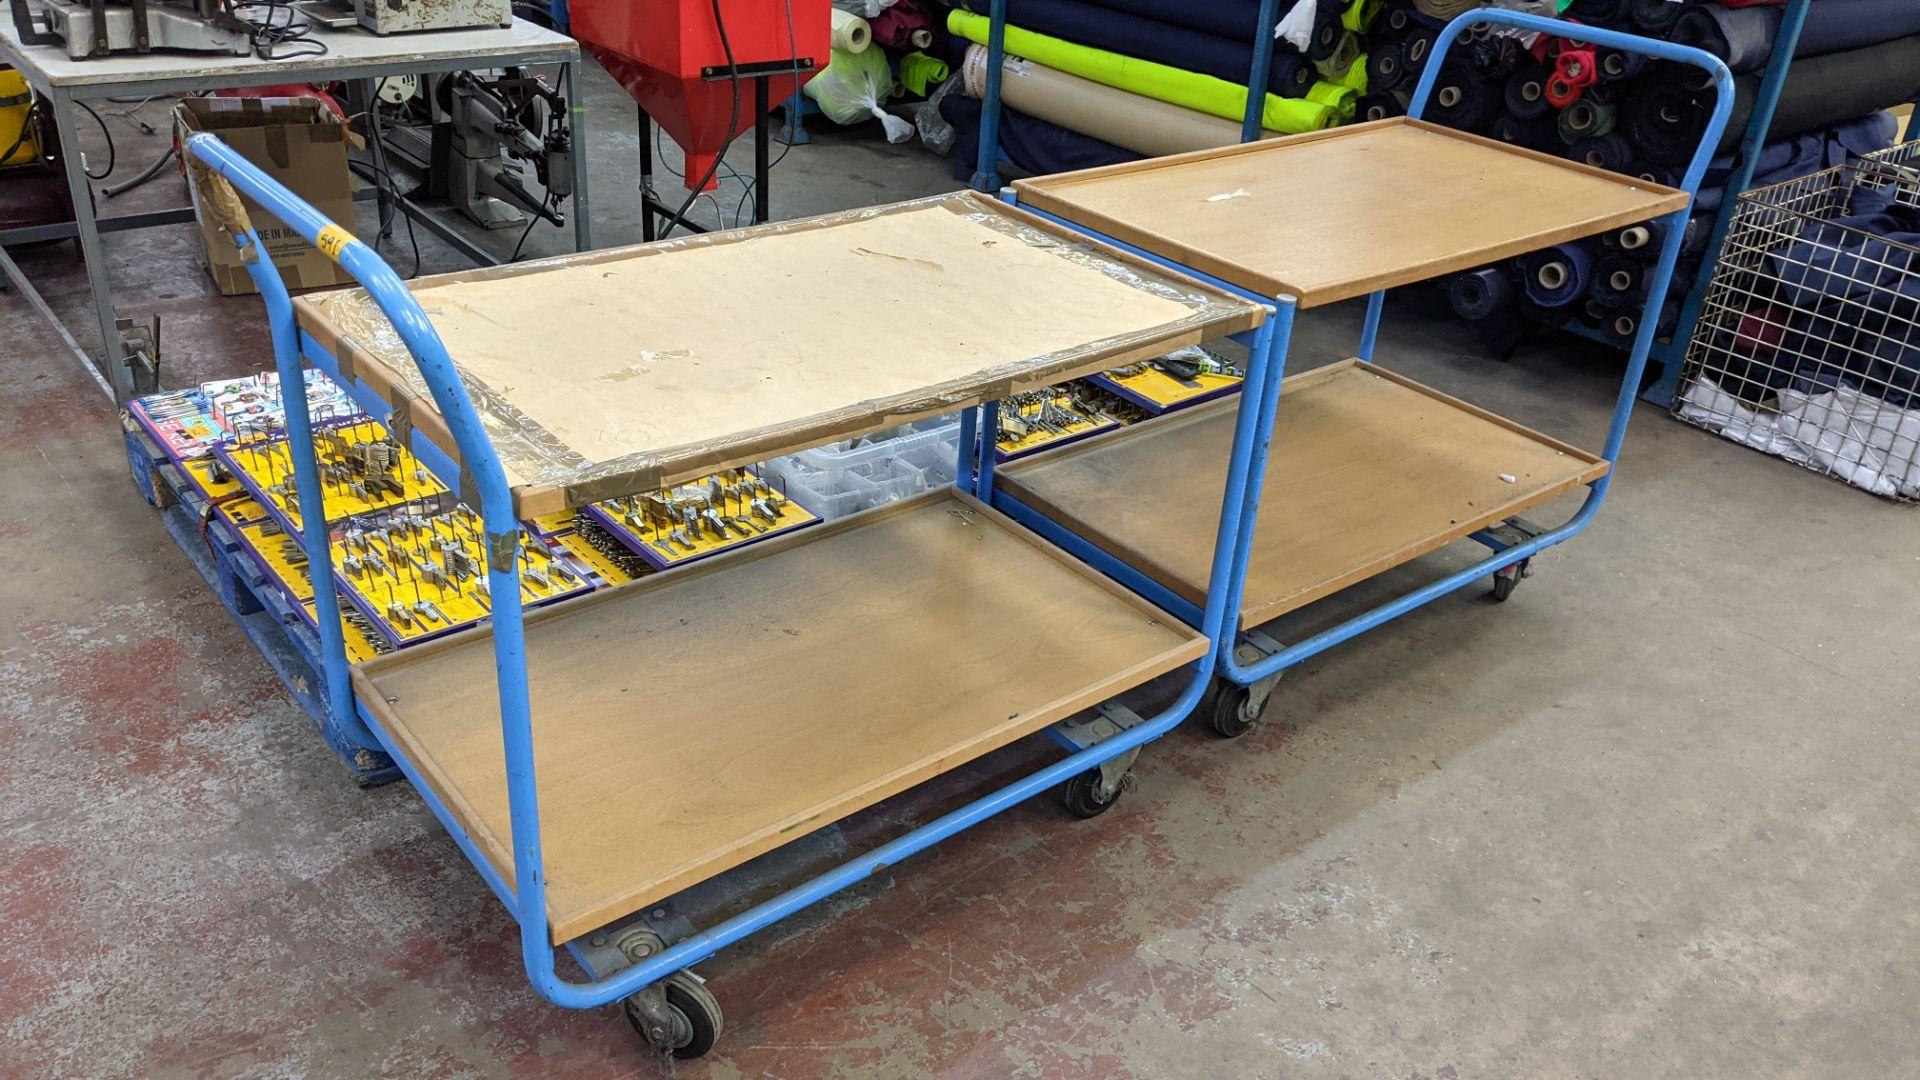 2 mobile twin shelf trolleys with lockable wheels - Image 5 of 7